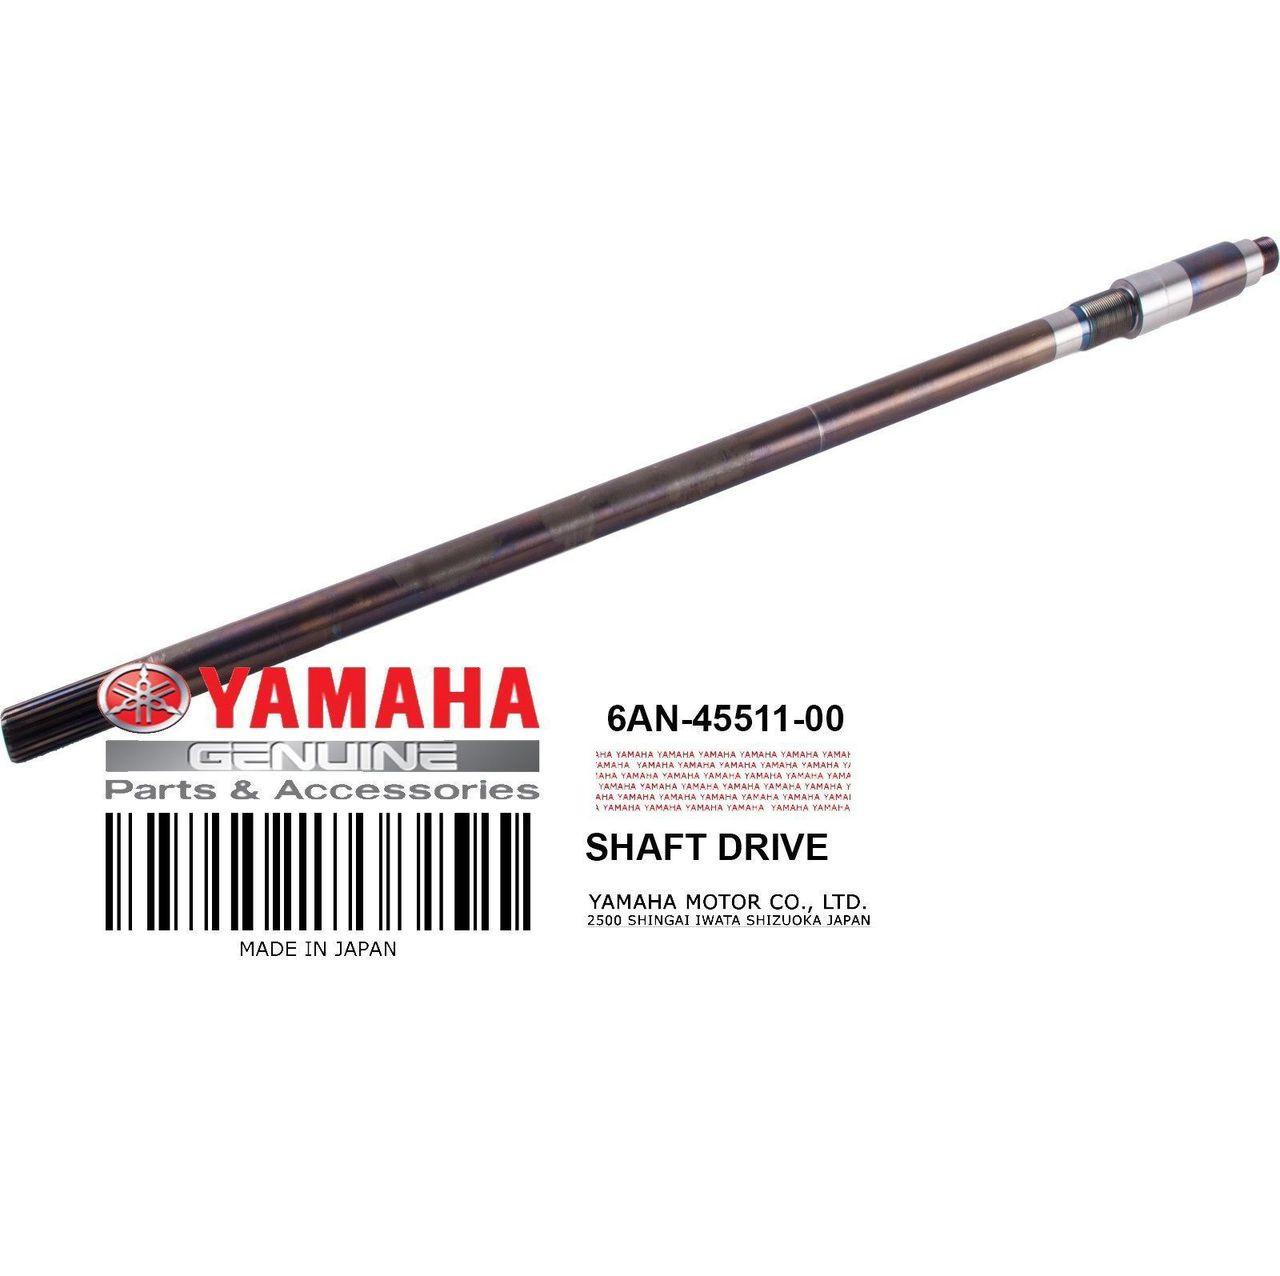 YAMAHA OEM Drive Shaft 6AN-45511-00-00 2009-2013 FZS FZR